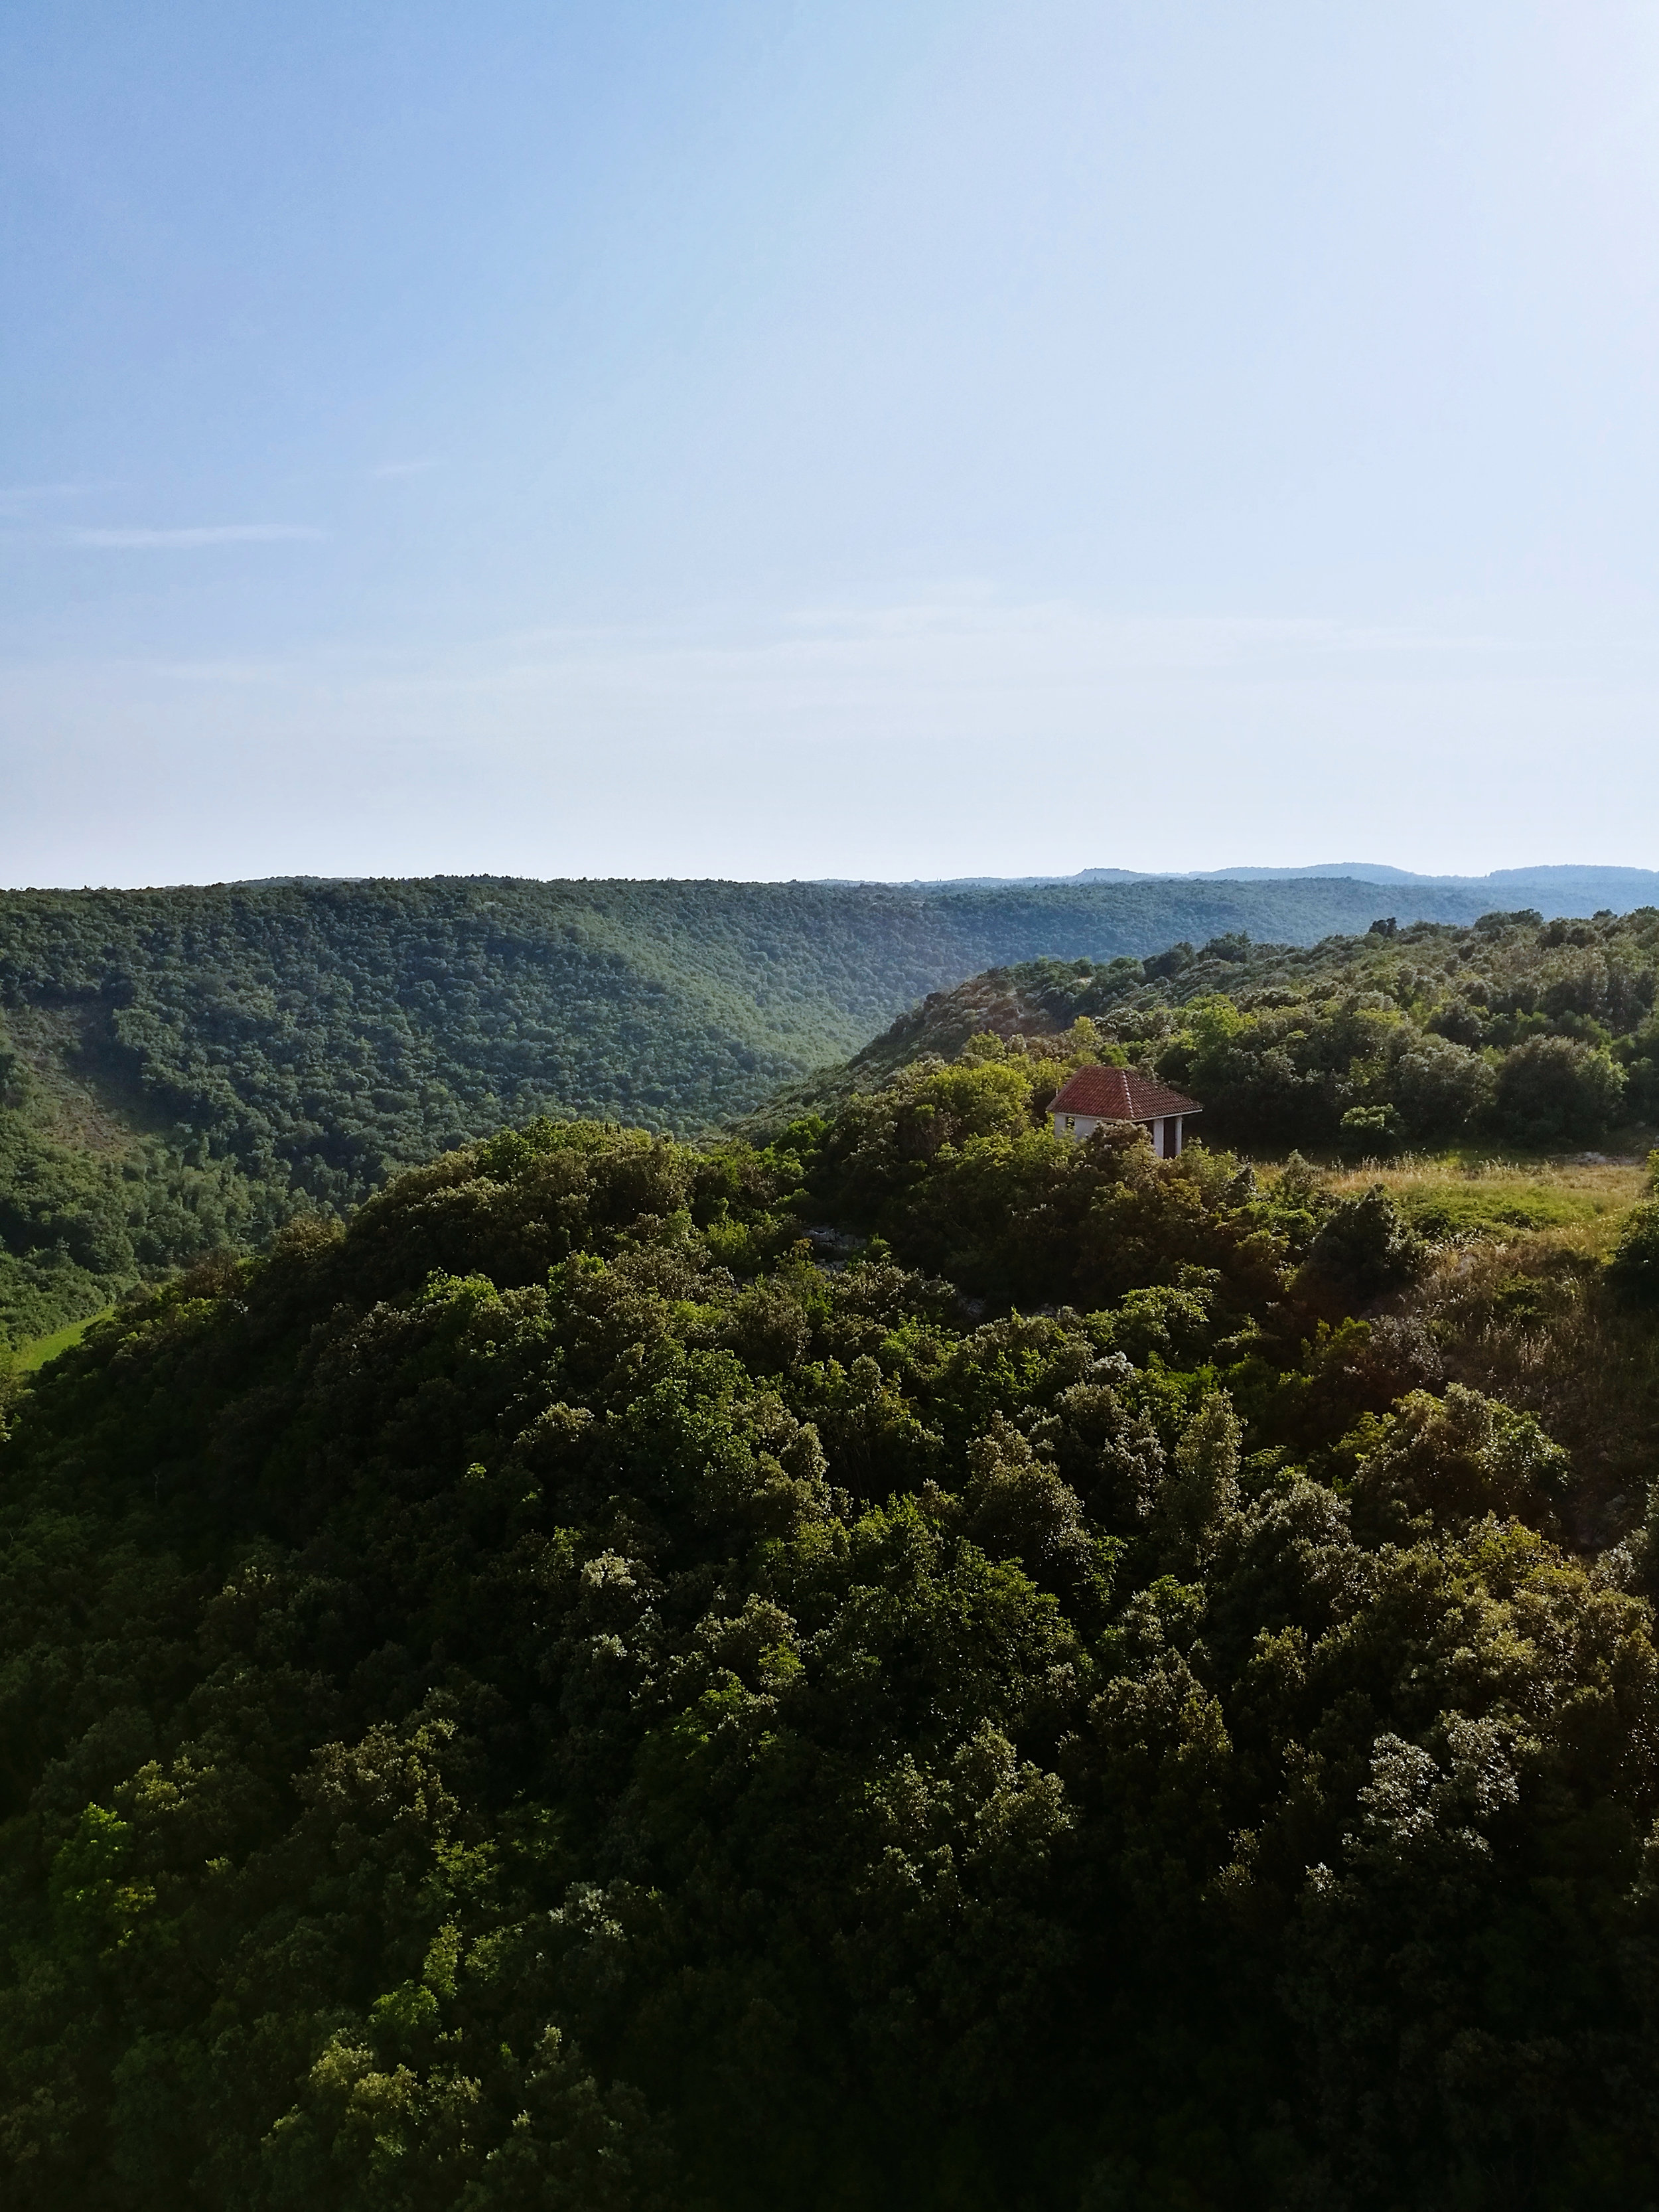 pula-kroatia-limska-draga-silta-maisema-mona-kajander-matkablogi.jpg